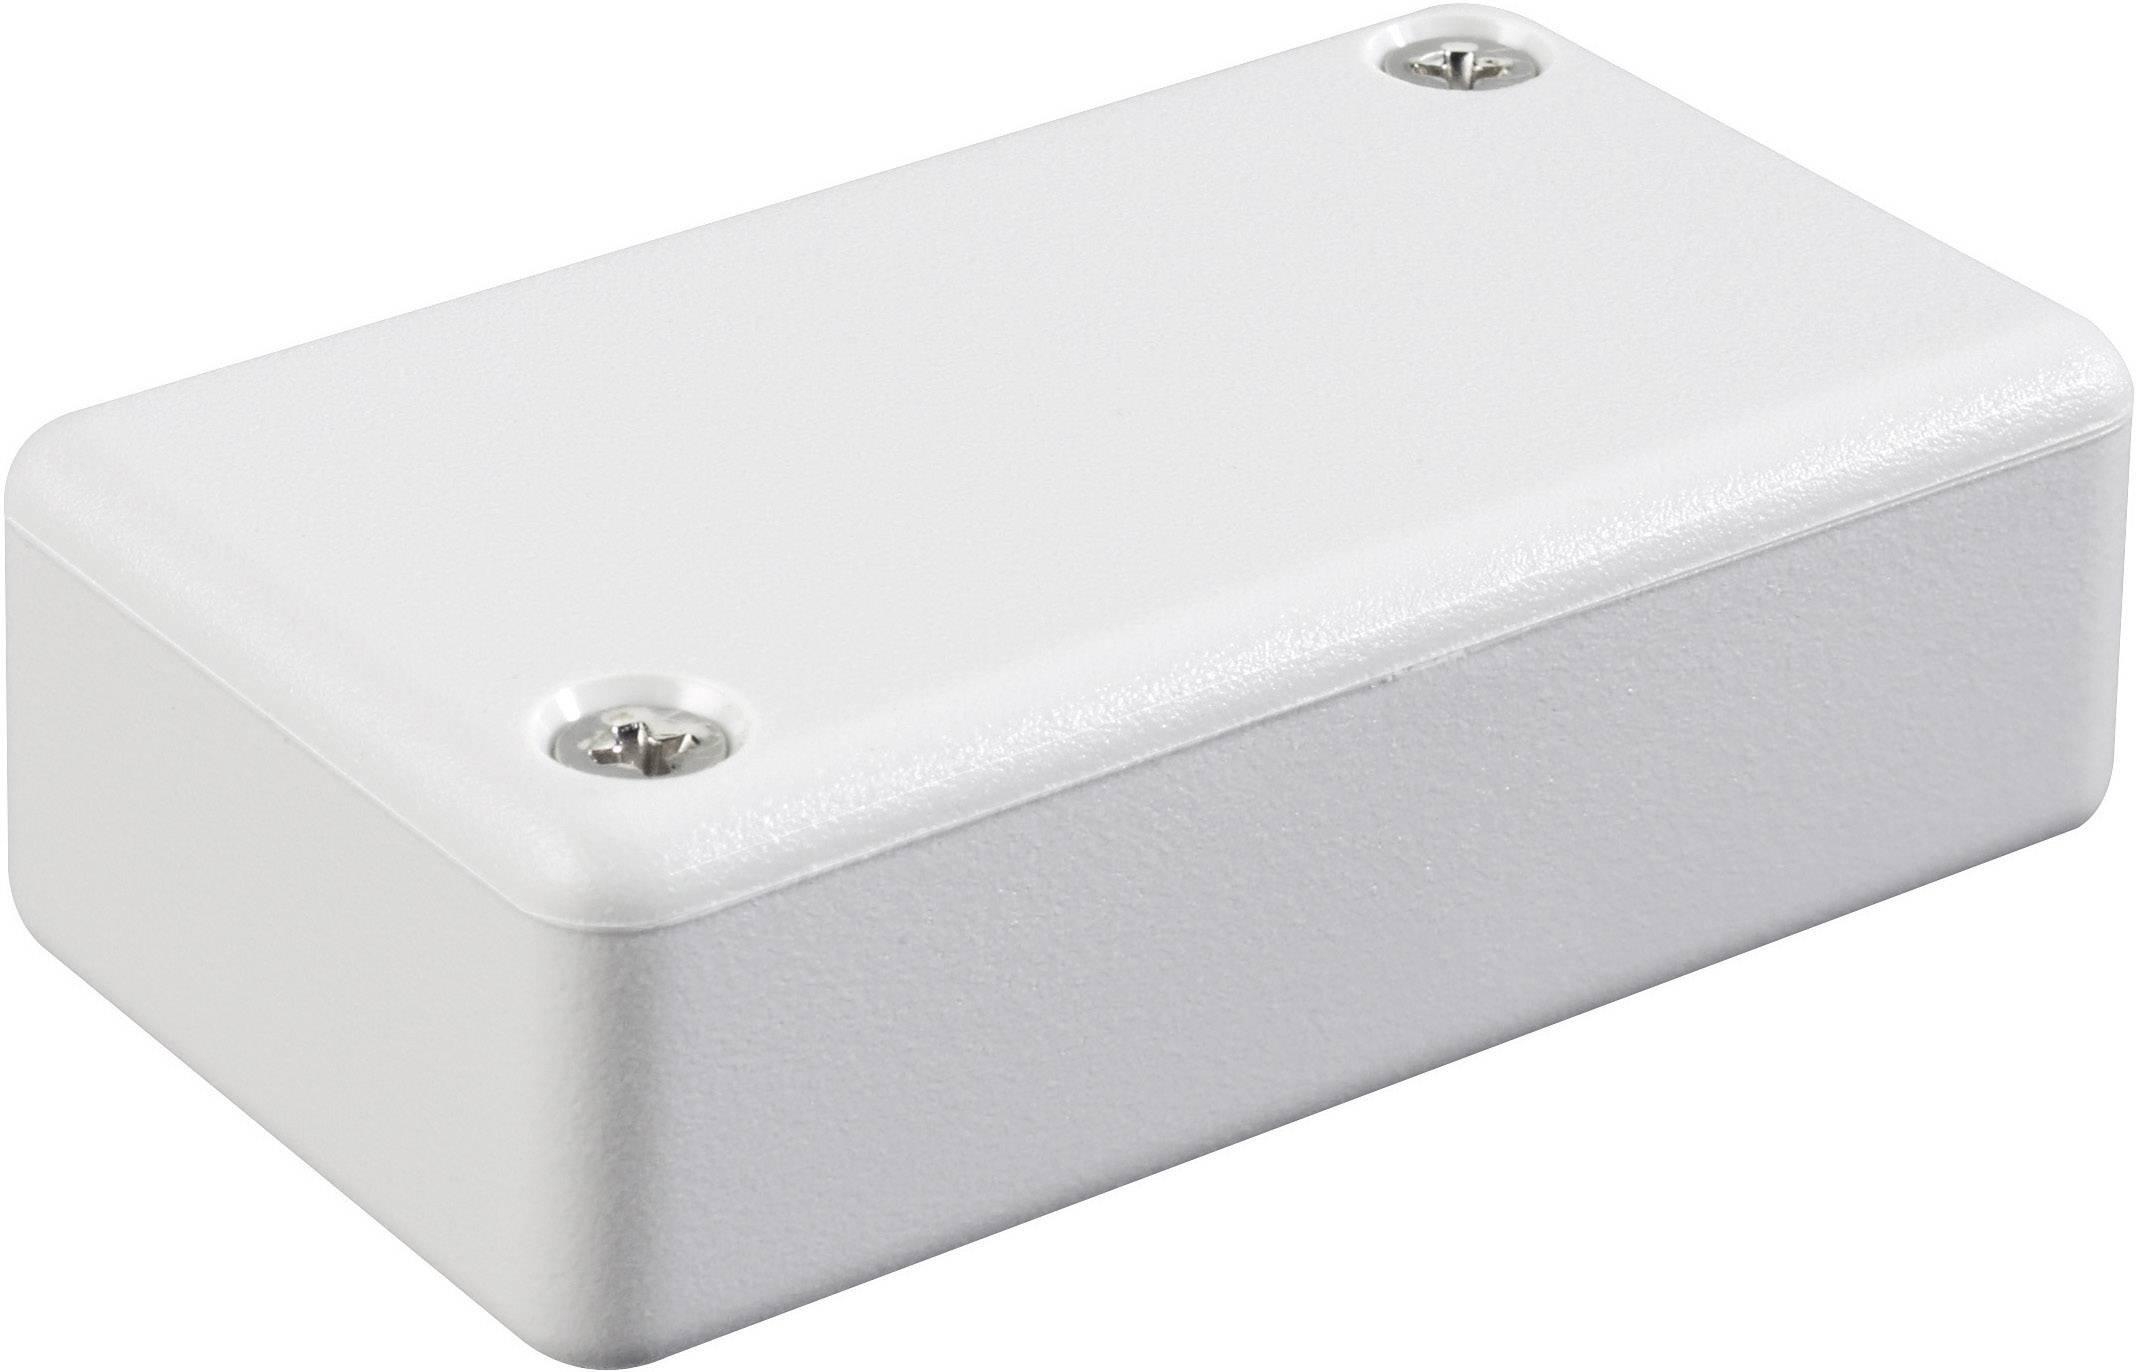 Euro krabice Hammond Electronics 1551FGY 1551FGY, 50 x 35 x 15 , ABS, svetlo sivá (RAL 7035), 1 ks